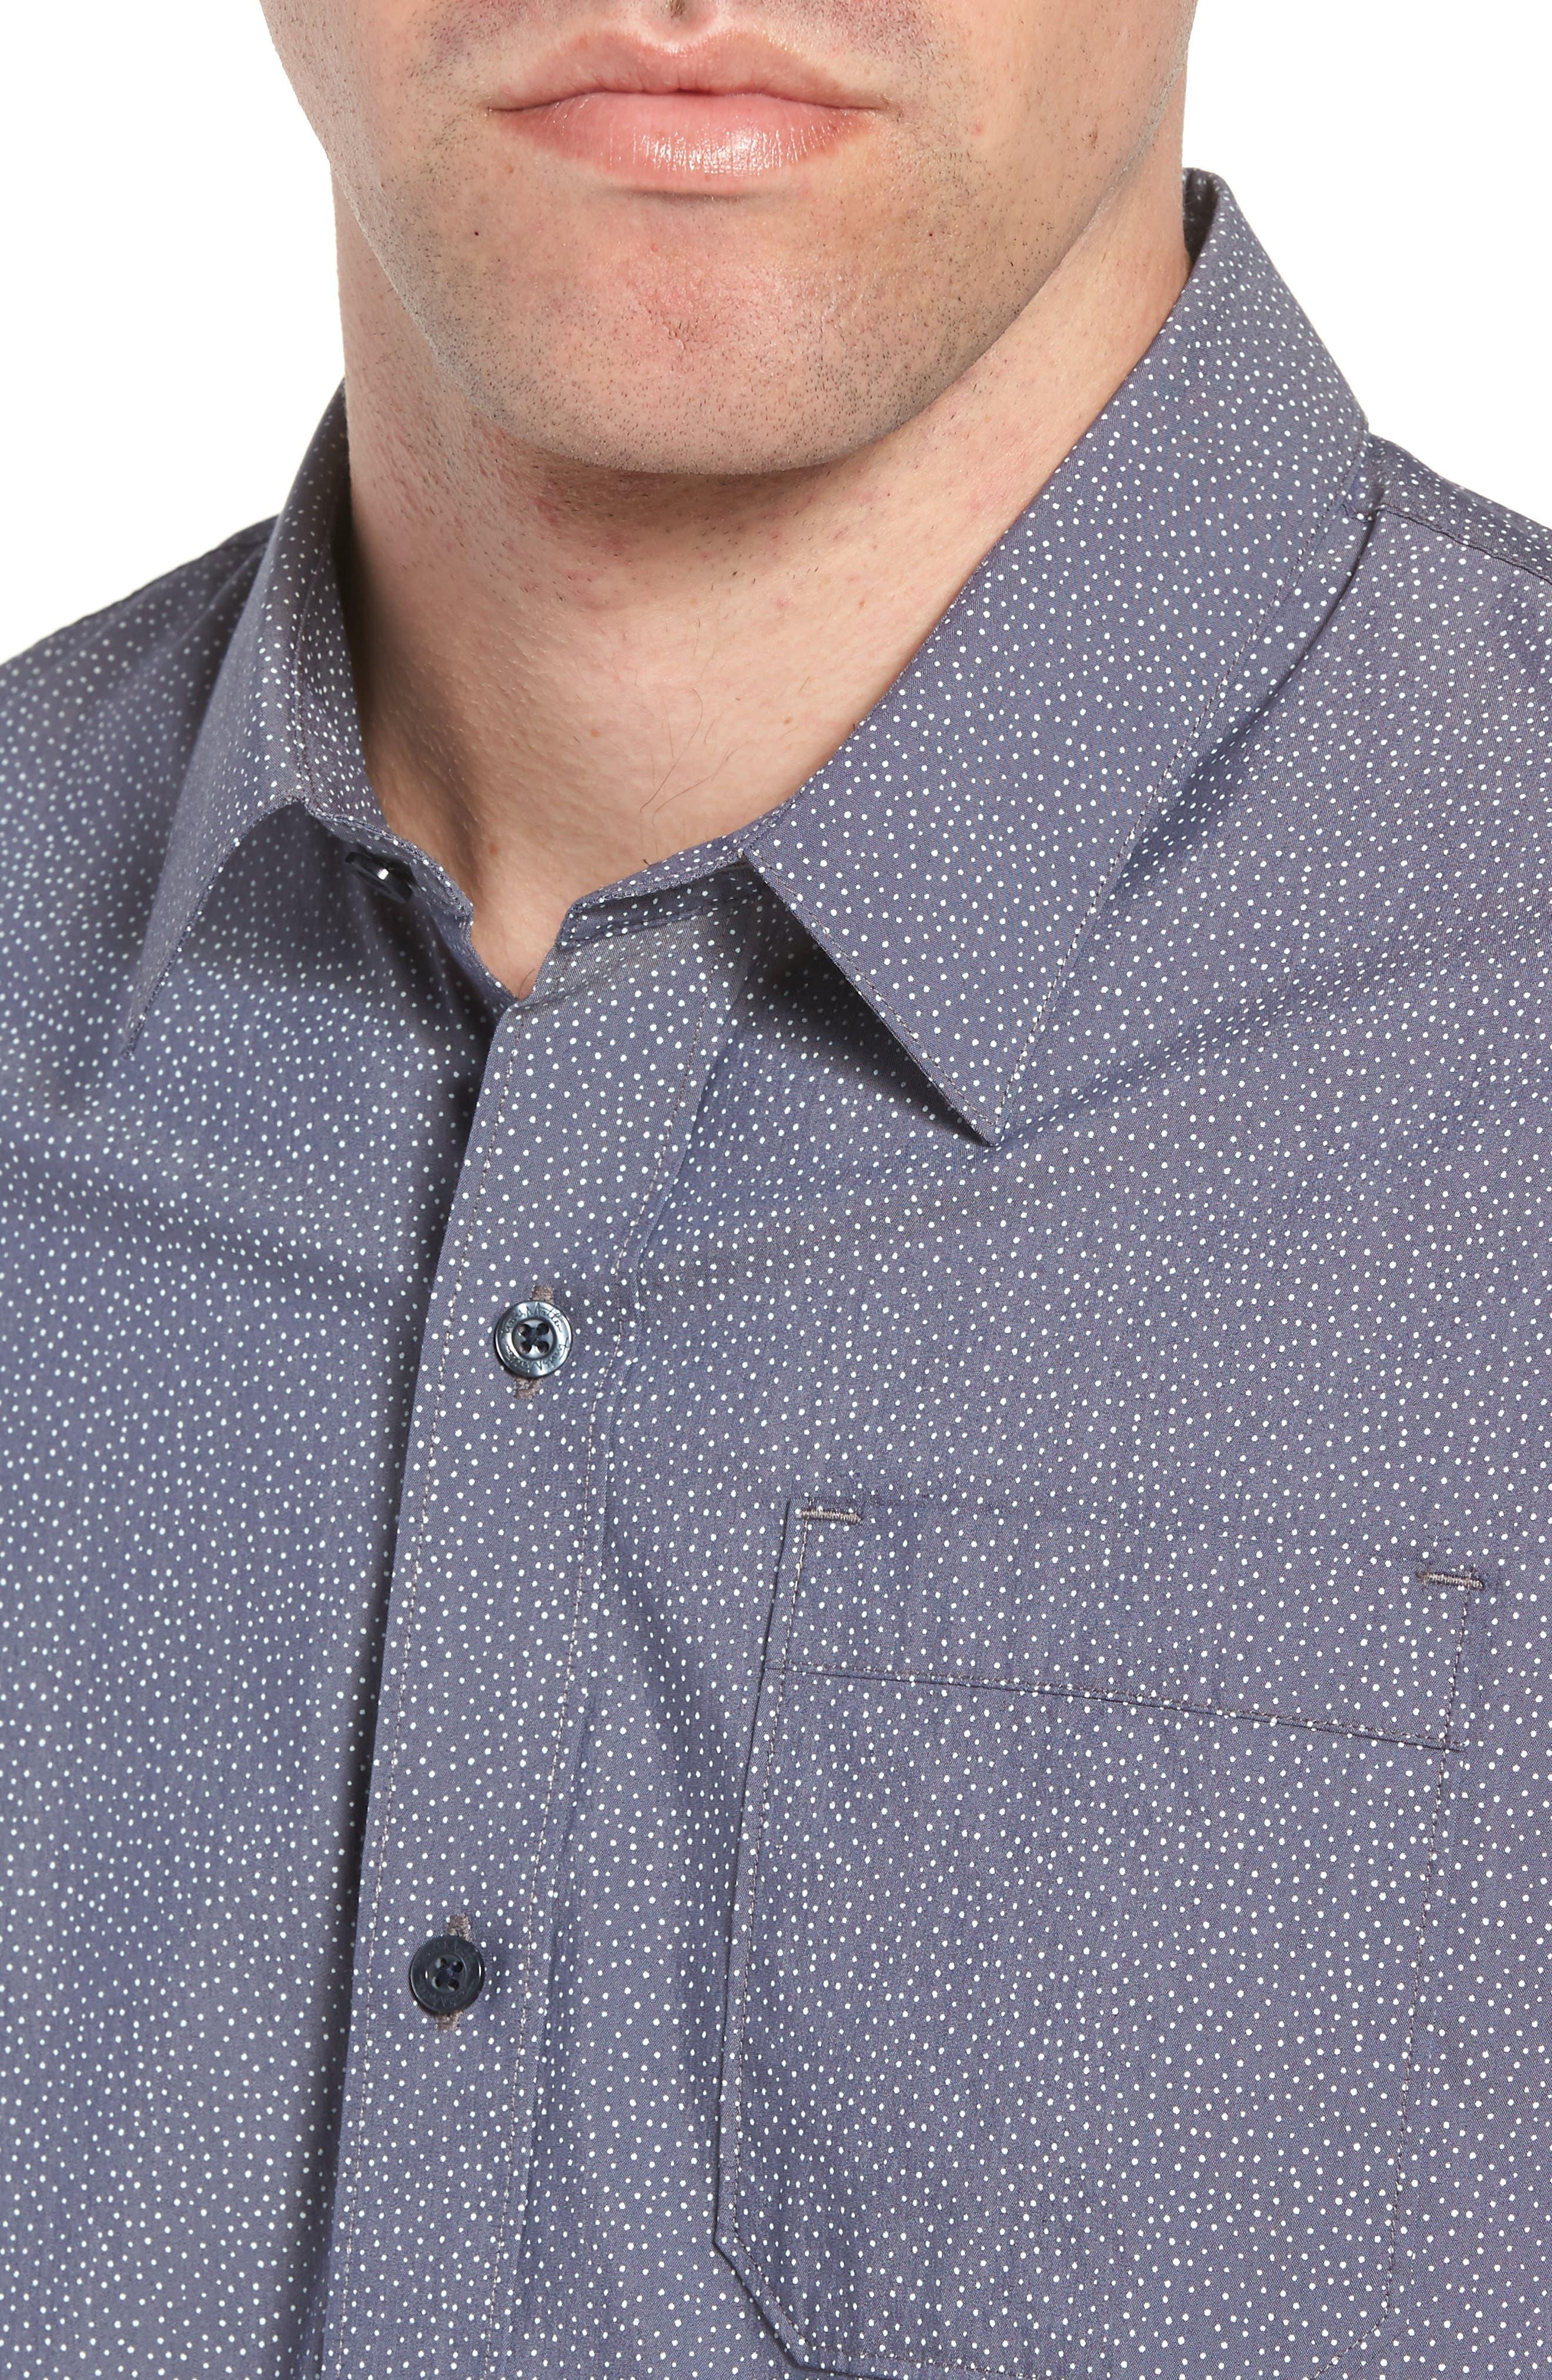 Particles Spot Print Sport Shirt,                             Alternate thumbnail 2, color,                             Blue Nights